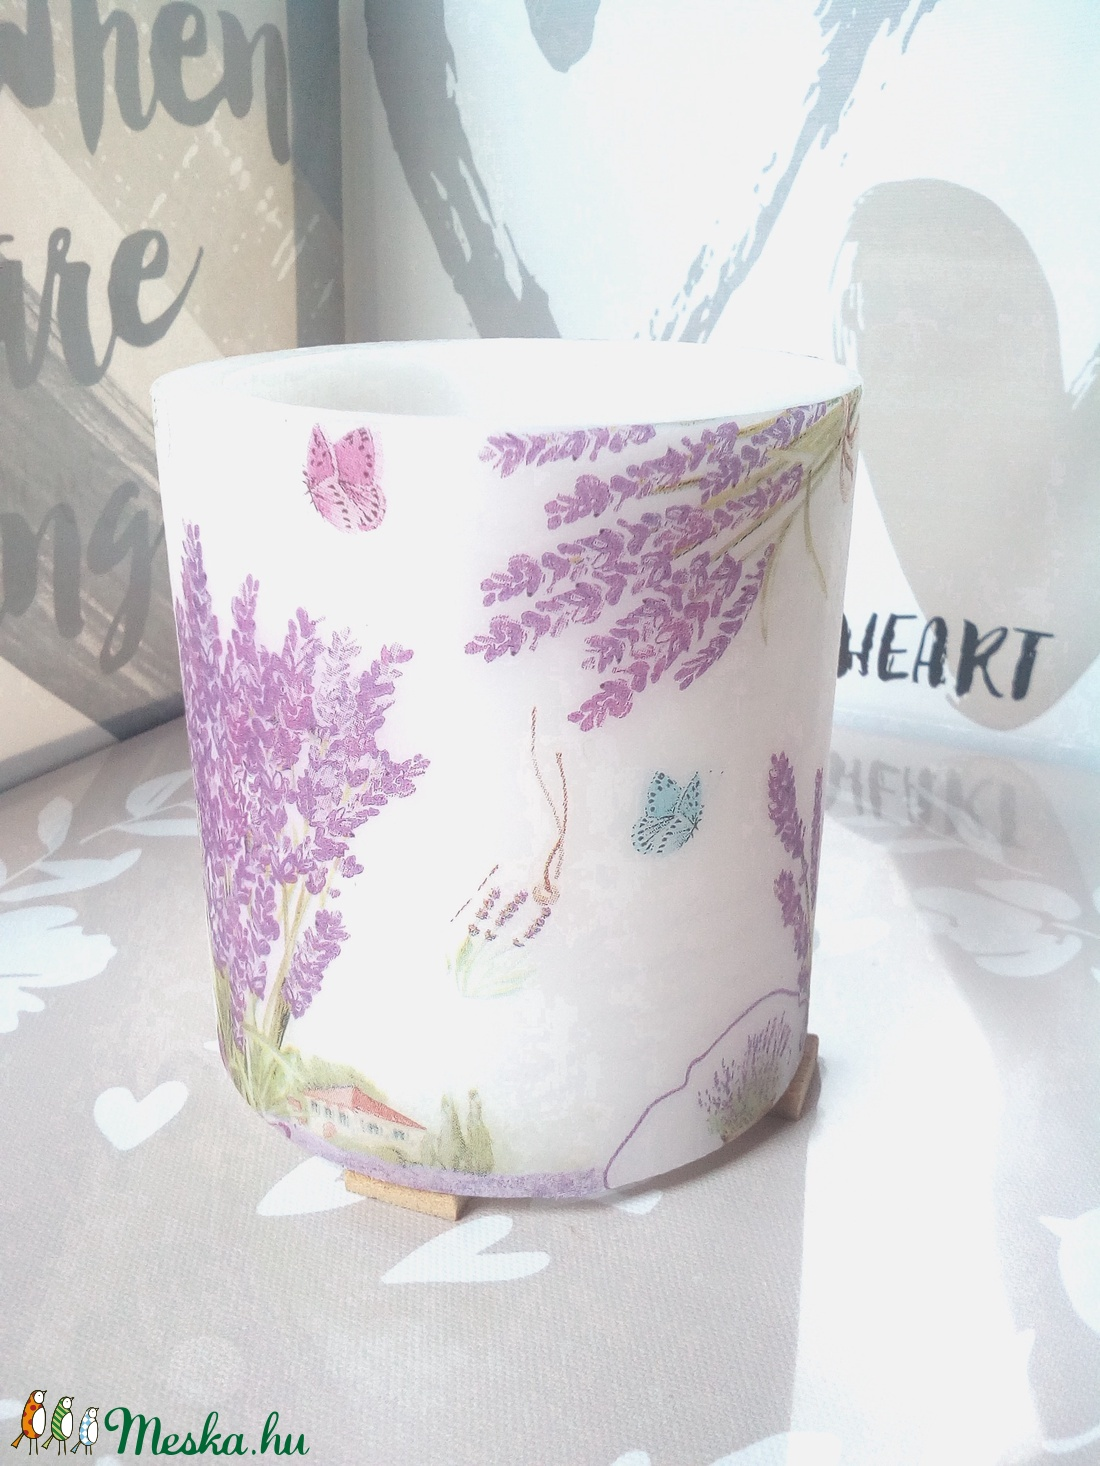 Bouquet de lavandeLampiongyertya  (lampiongyertya) - Meska.hu